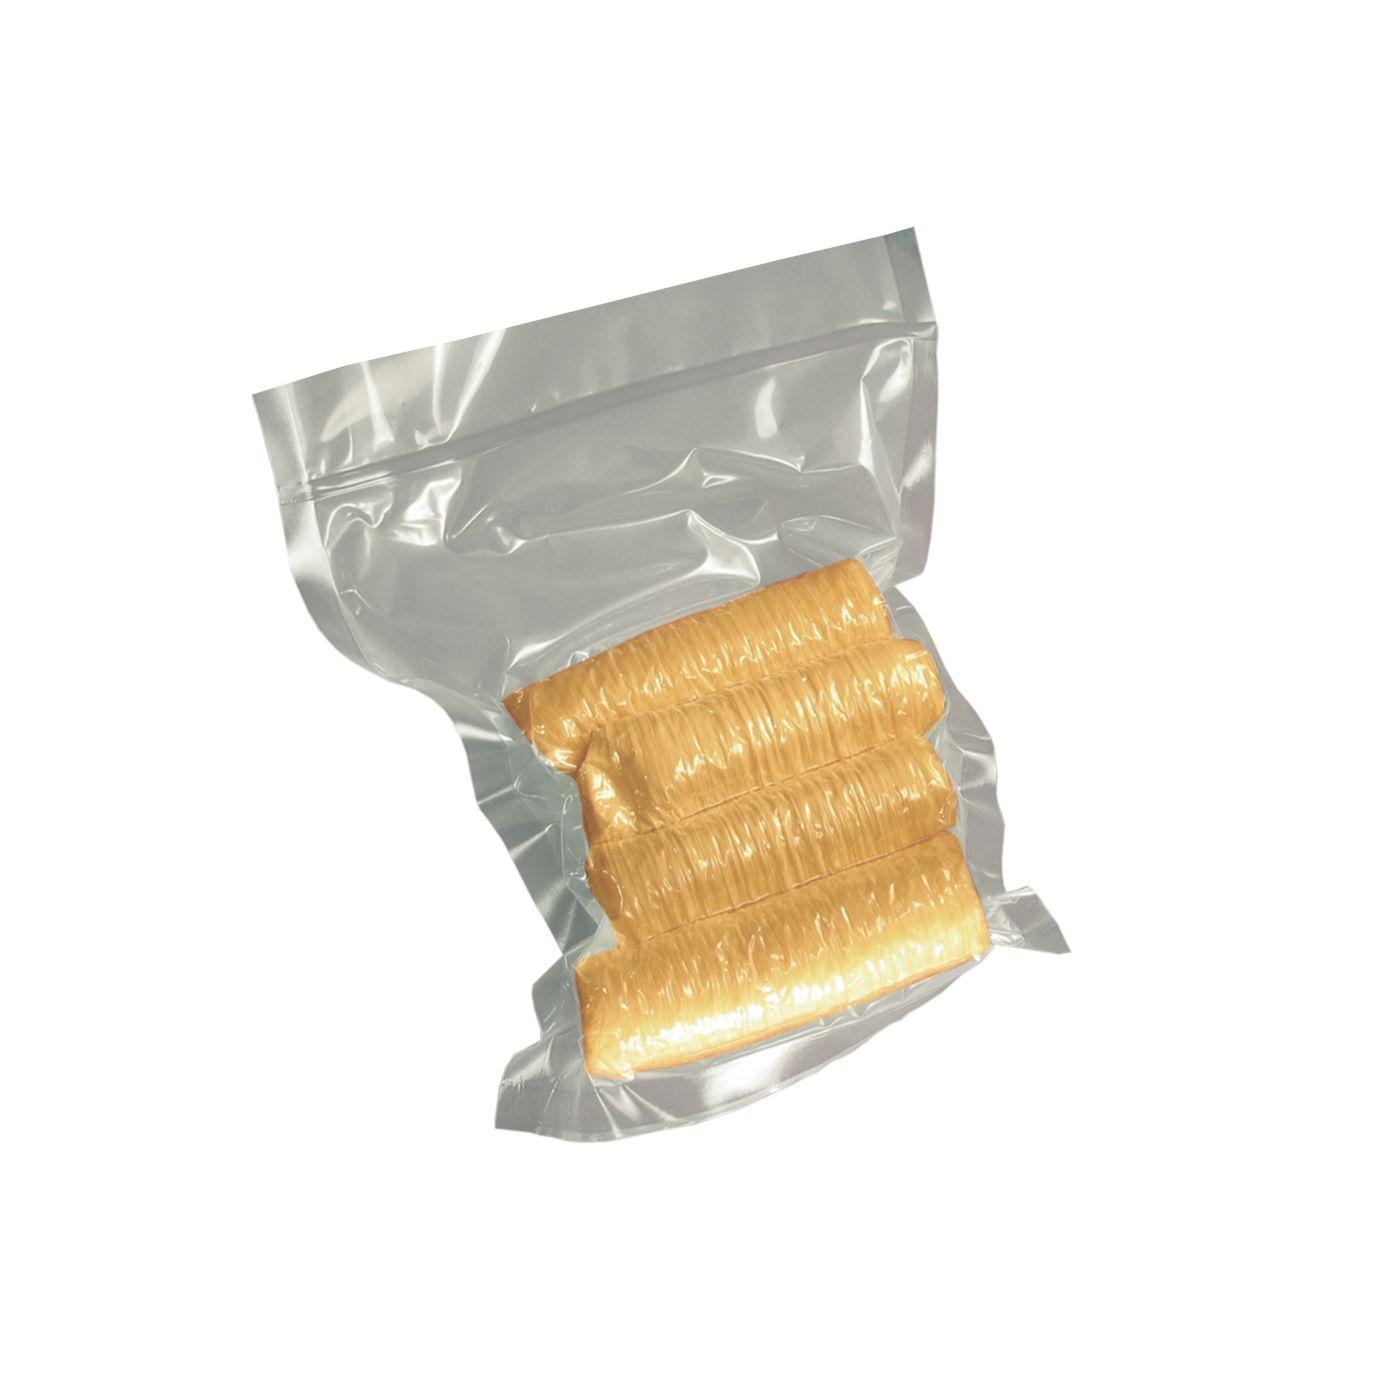 Weston 38mm Edible Processed Type Collagen Casings